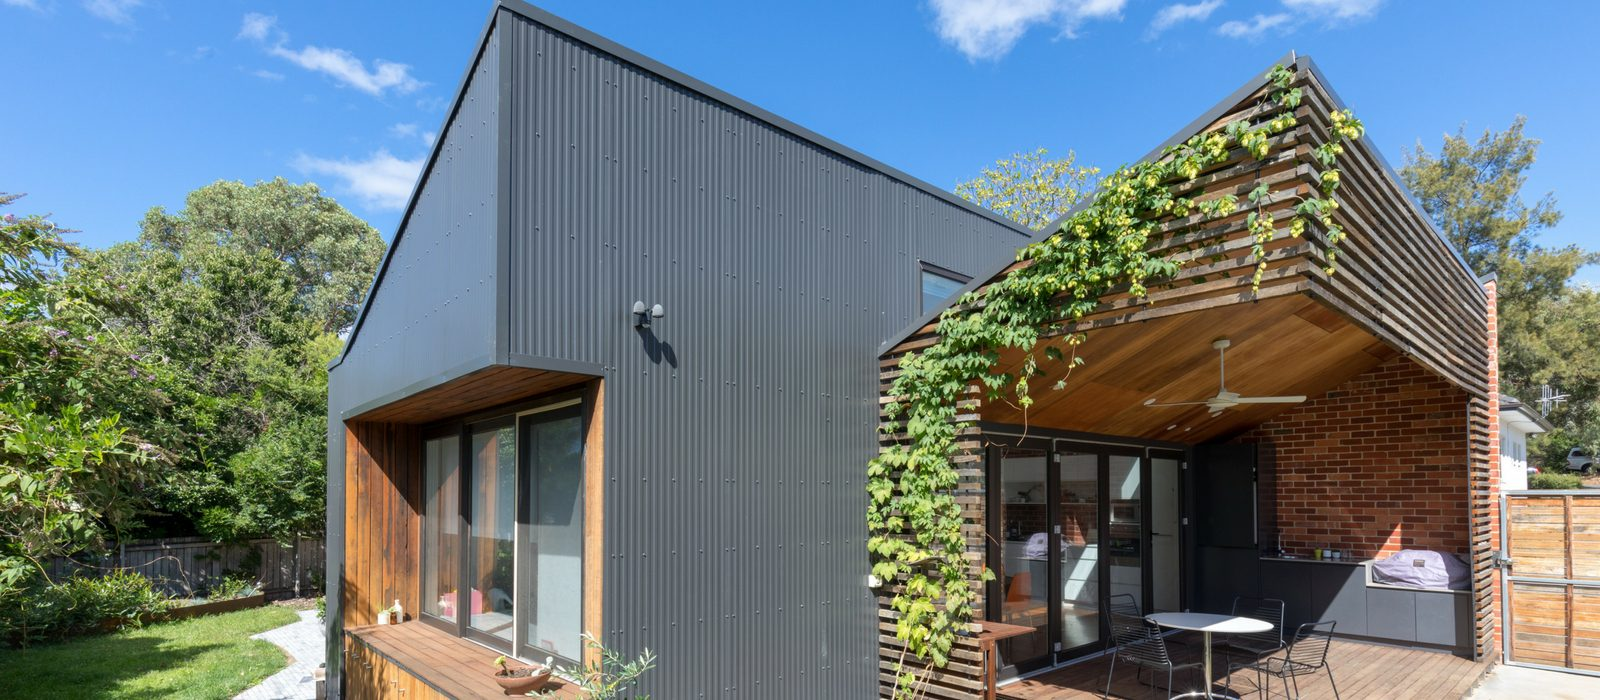 Architect Judd Studios, Sawtooth House. Photo LightStudies